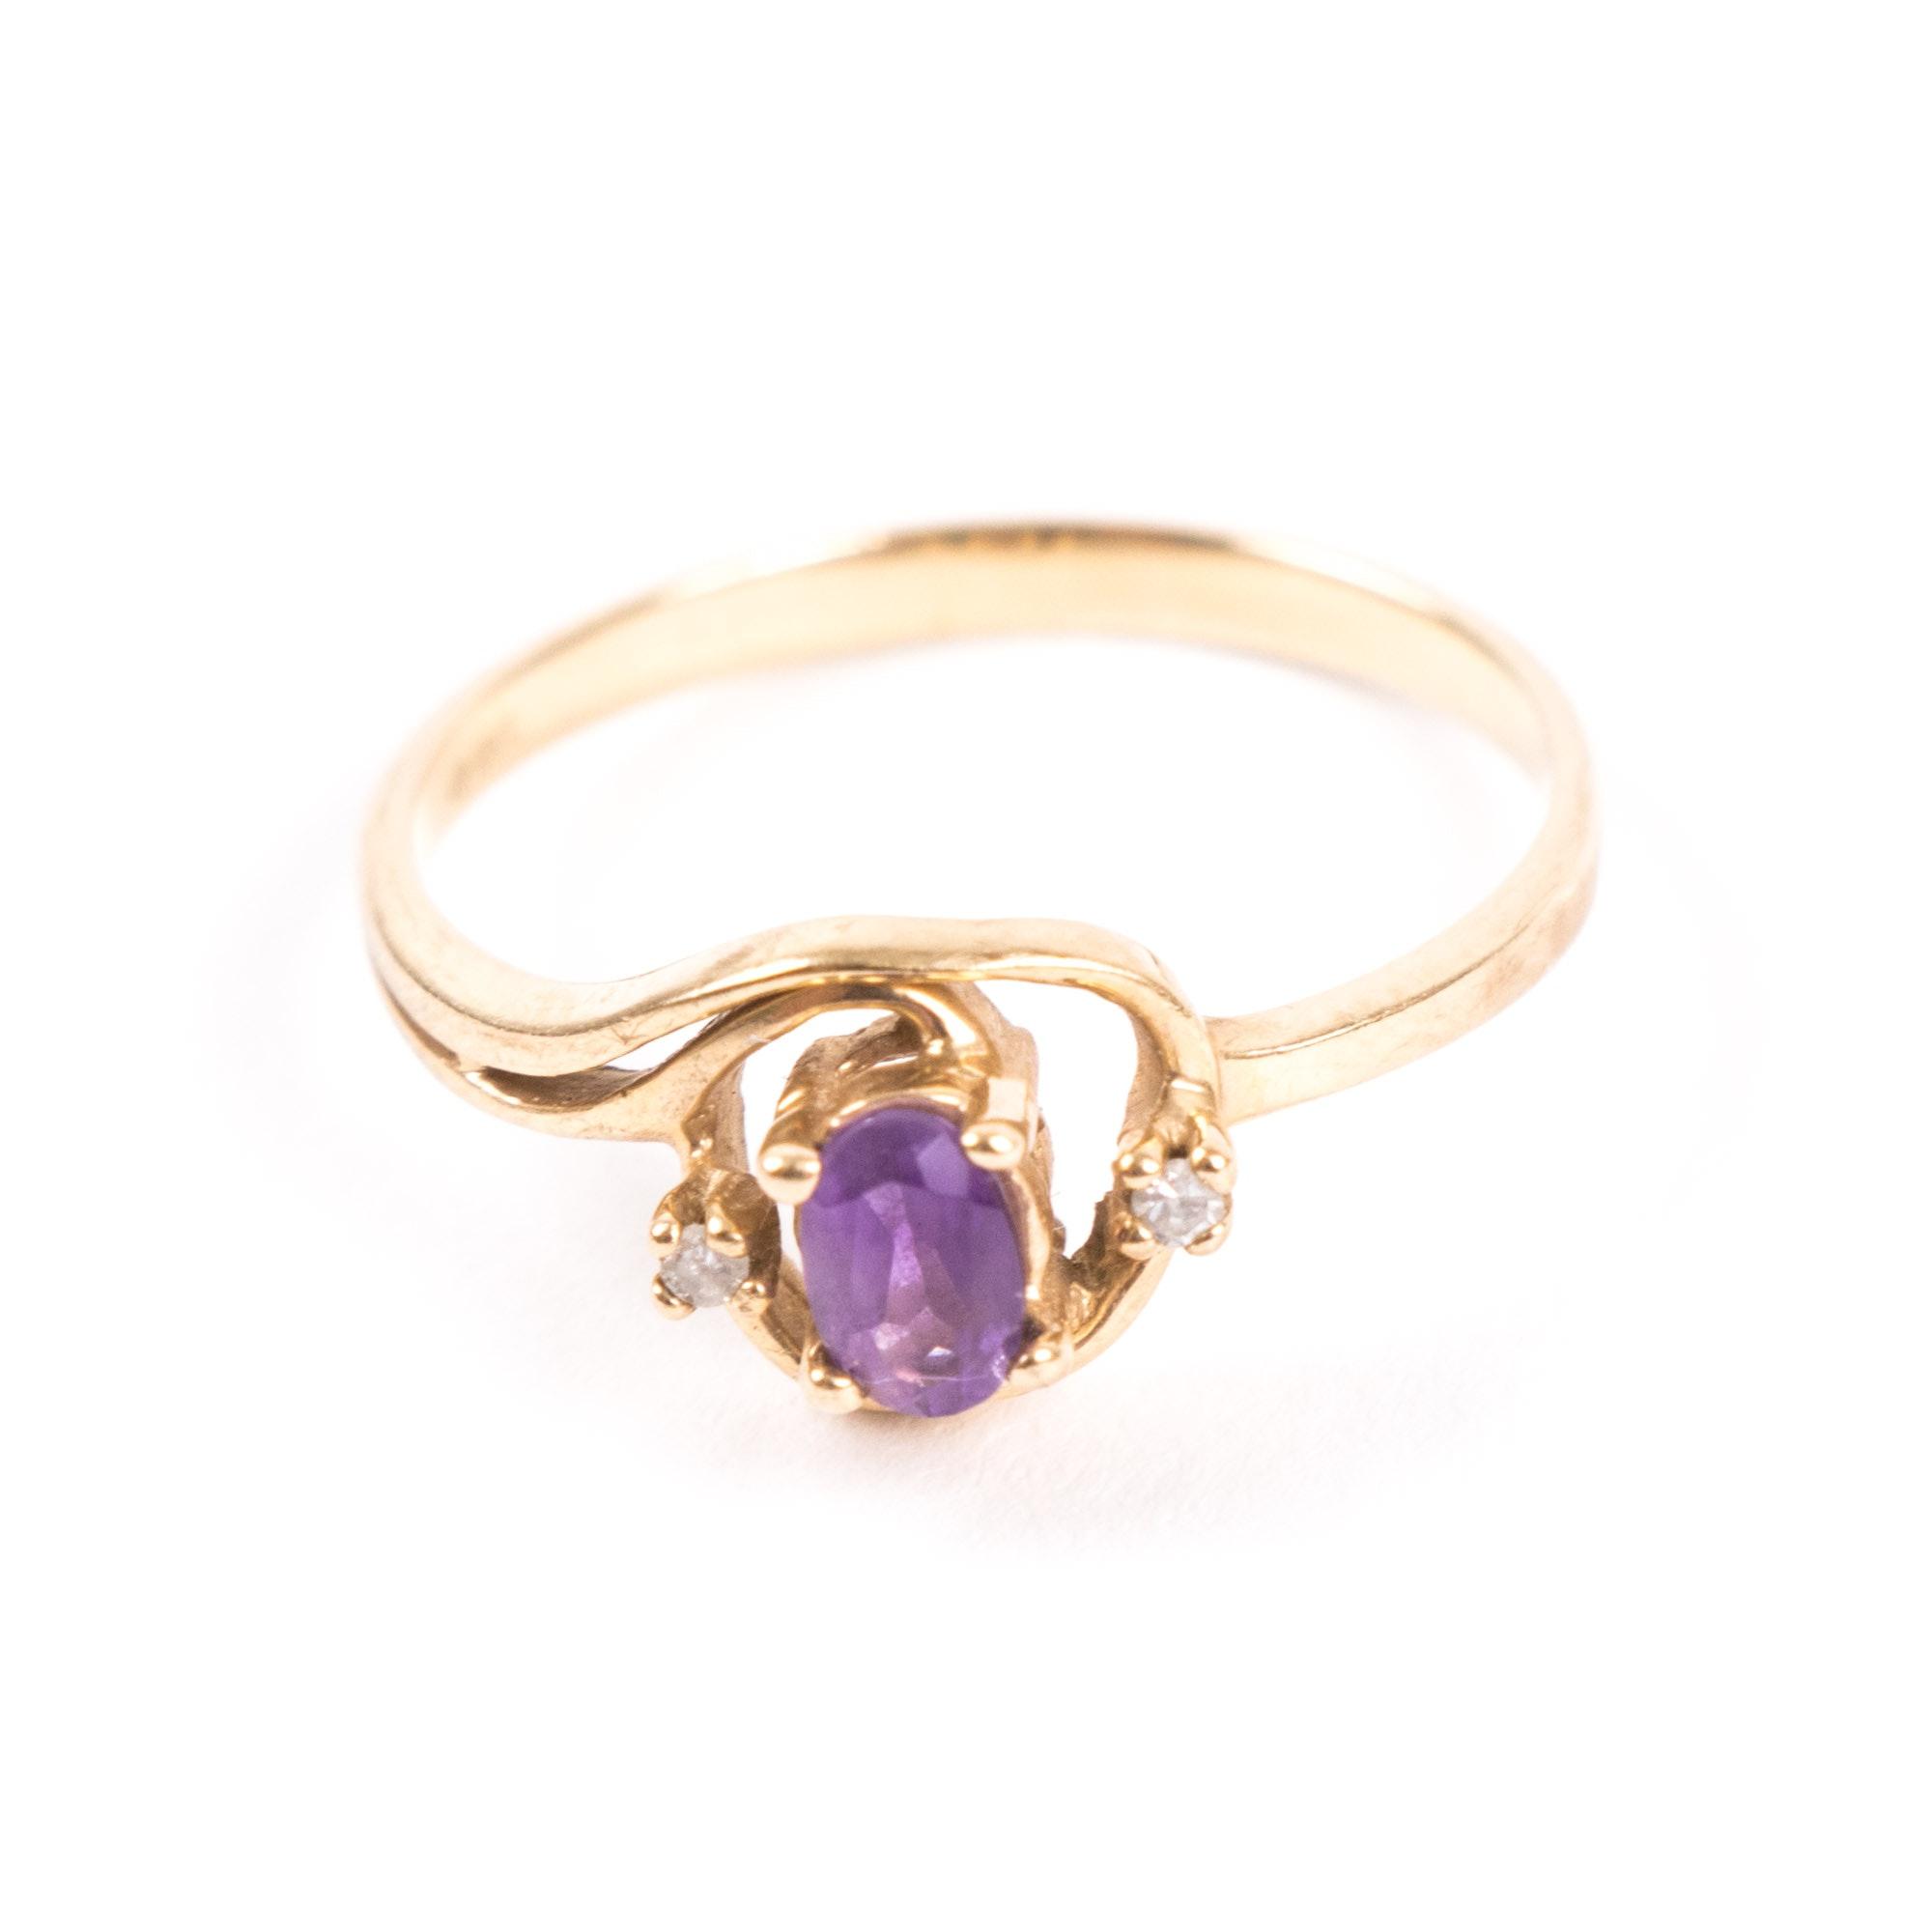 10K Yellow Gold, Amethyst, and Diamond Ring